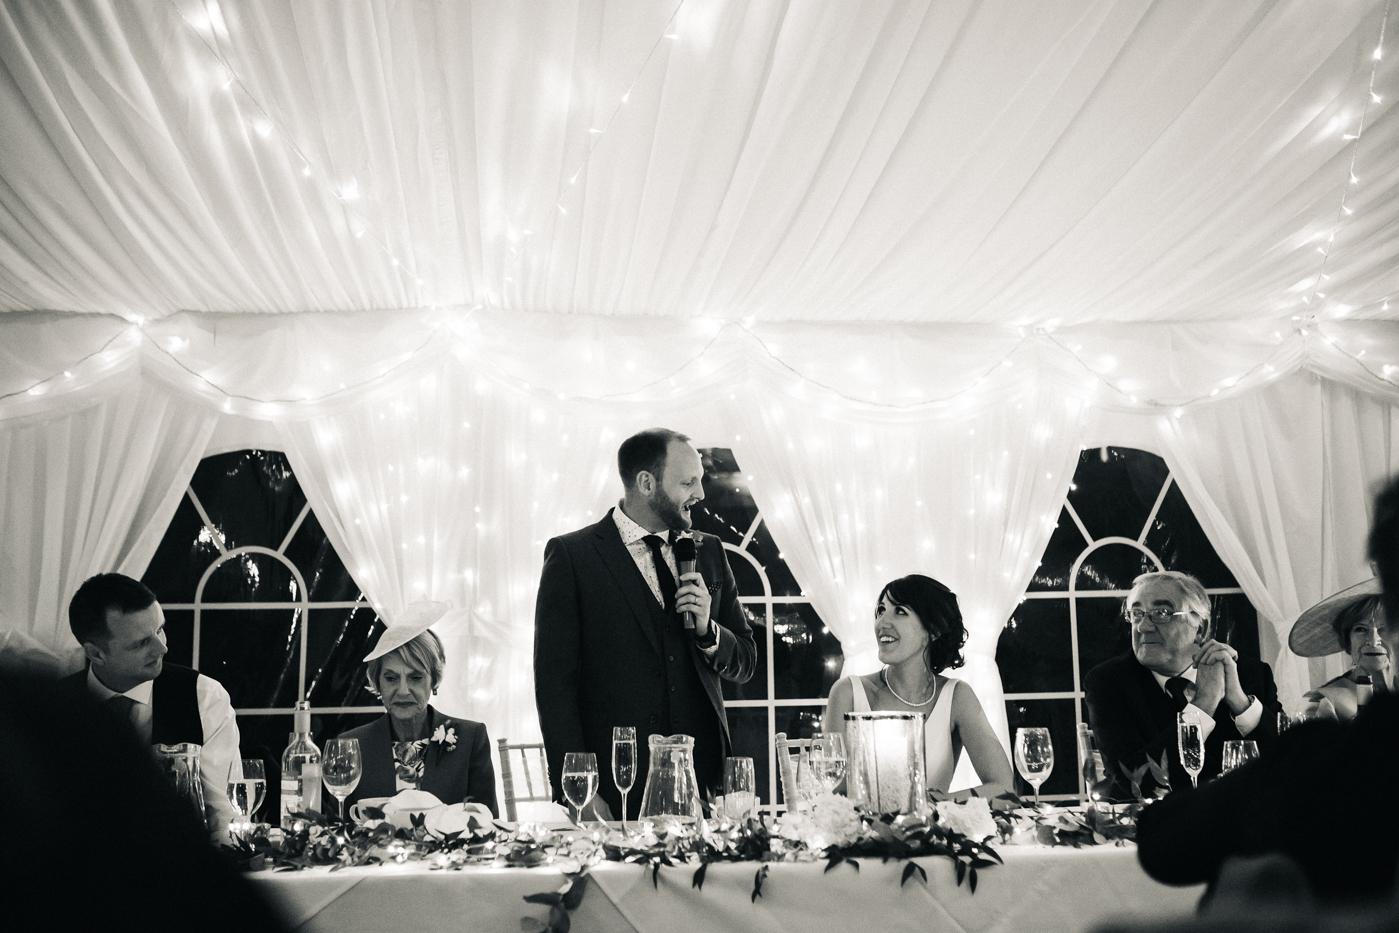 york-house-malton-wedding-photographer-north-yorkshire-0037.jpg